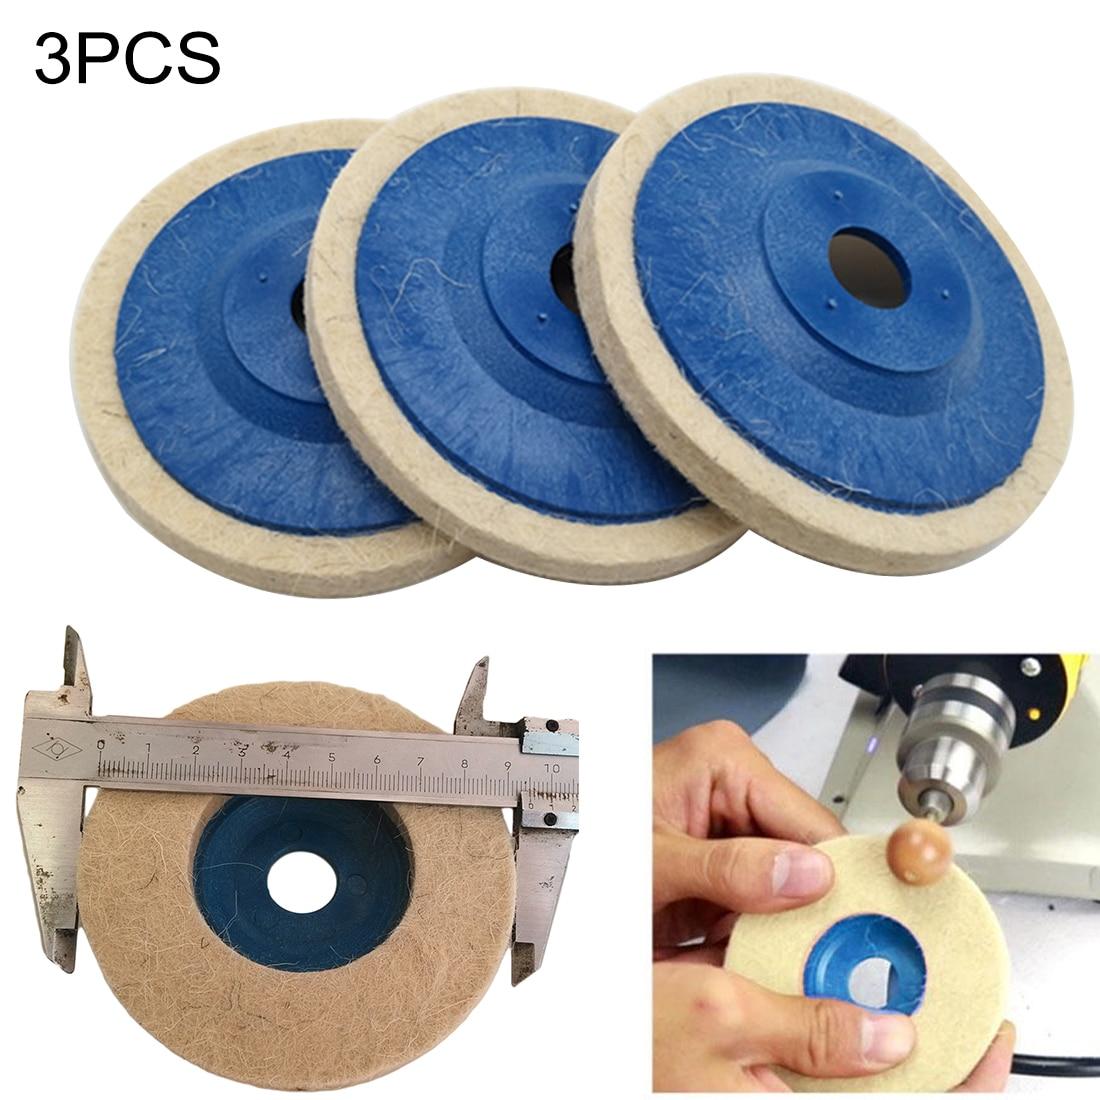 3pcs 4 Inch Wool Polishing Pads Buffing Angle Grinder Wheel Felt Polishing Disc Pad Set 100mm